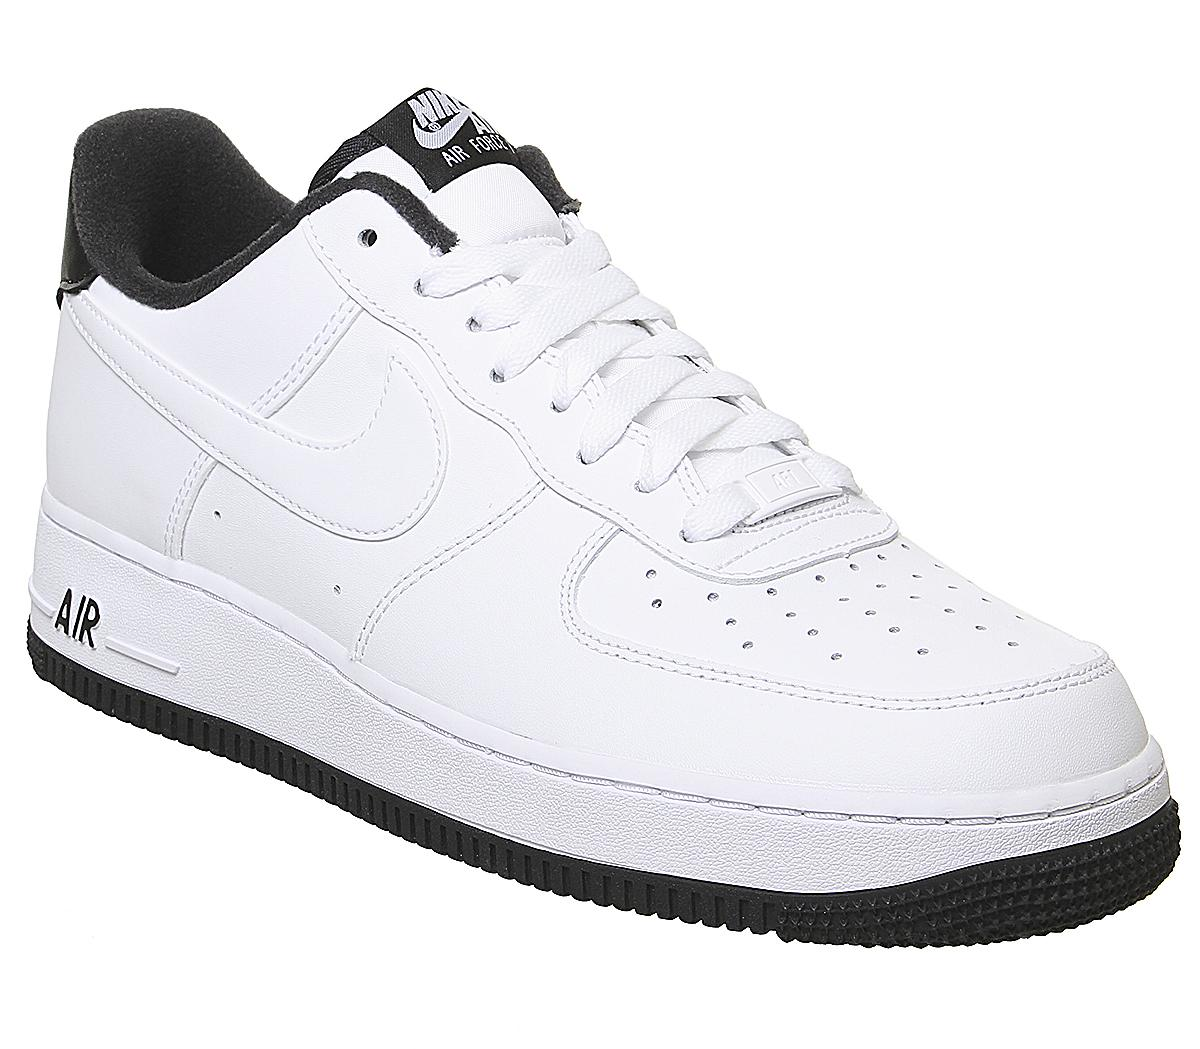 nike air force 1 07 white and black